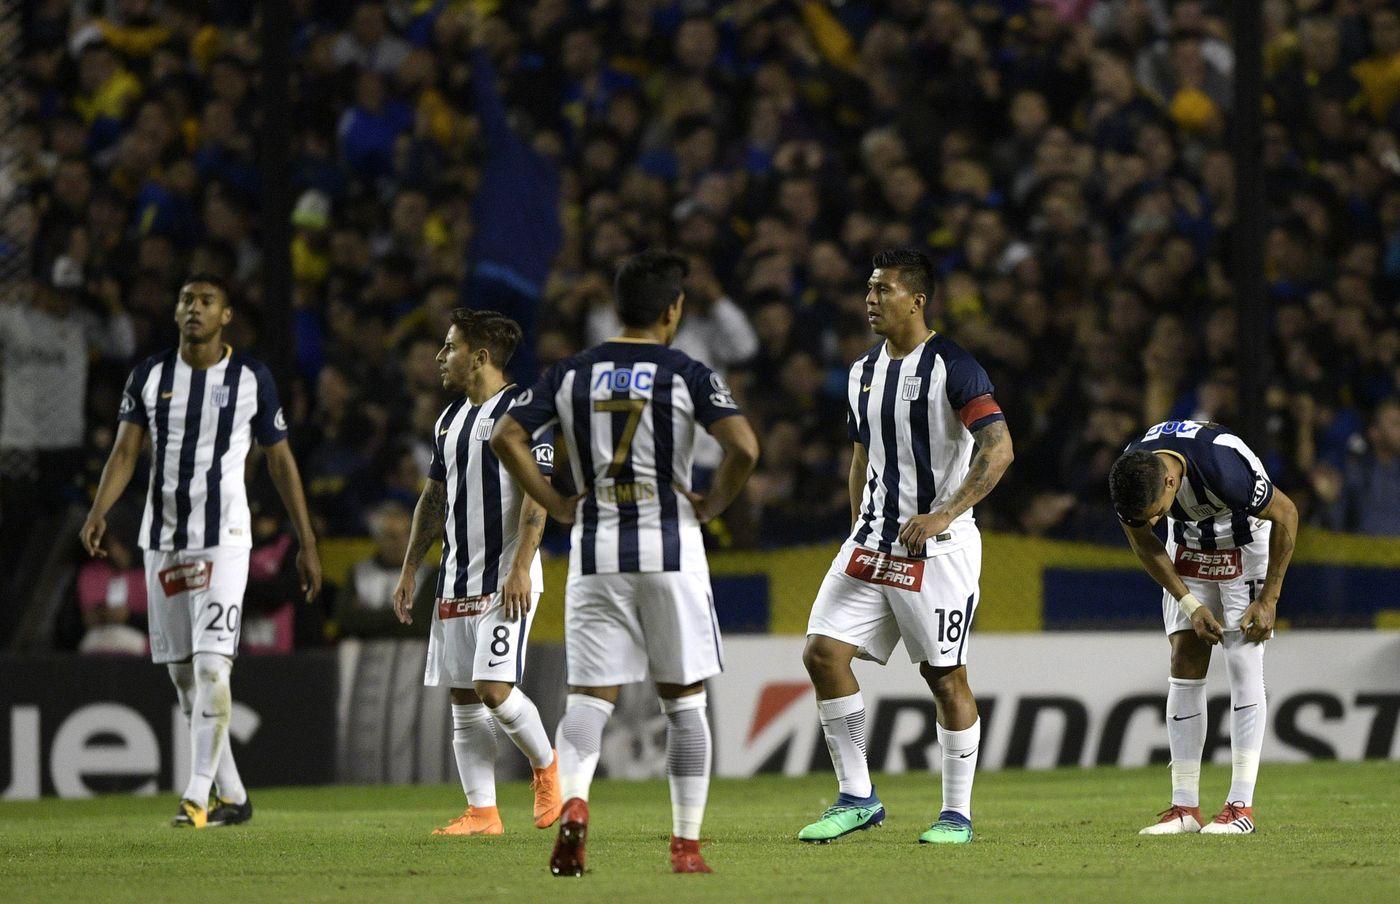 Primera Division Perù venerdì 19 luglio